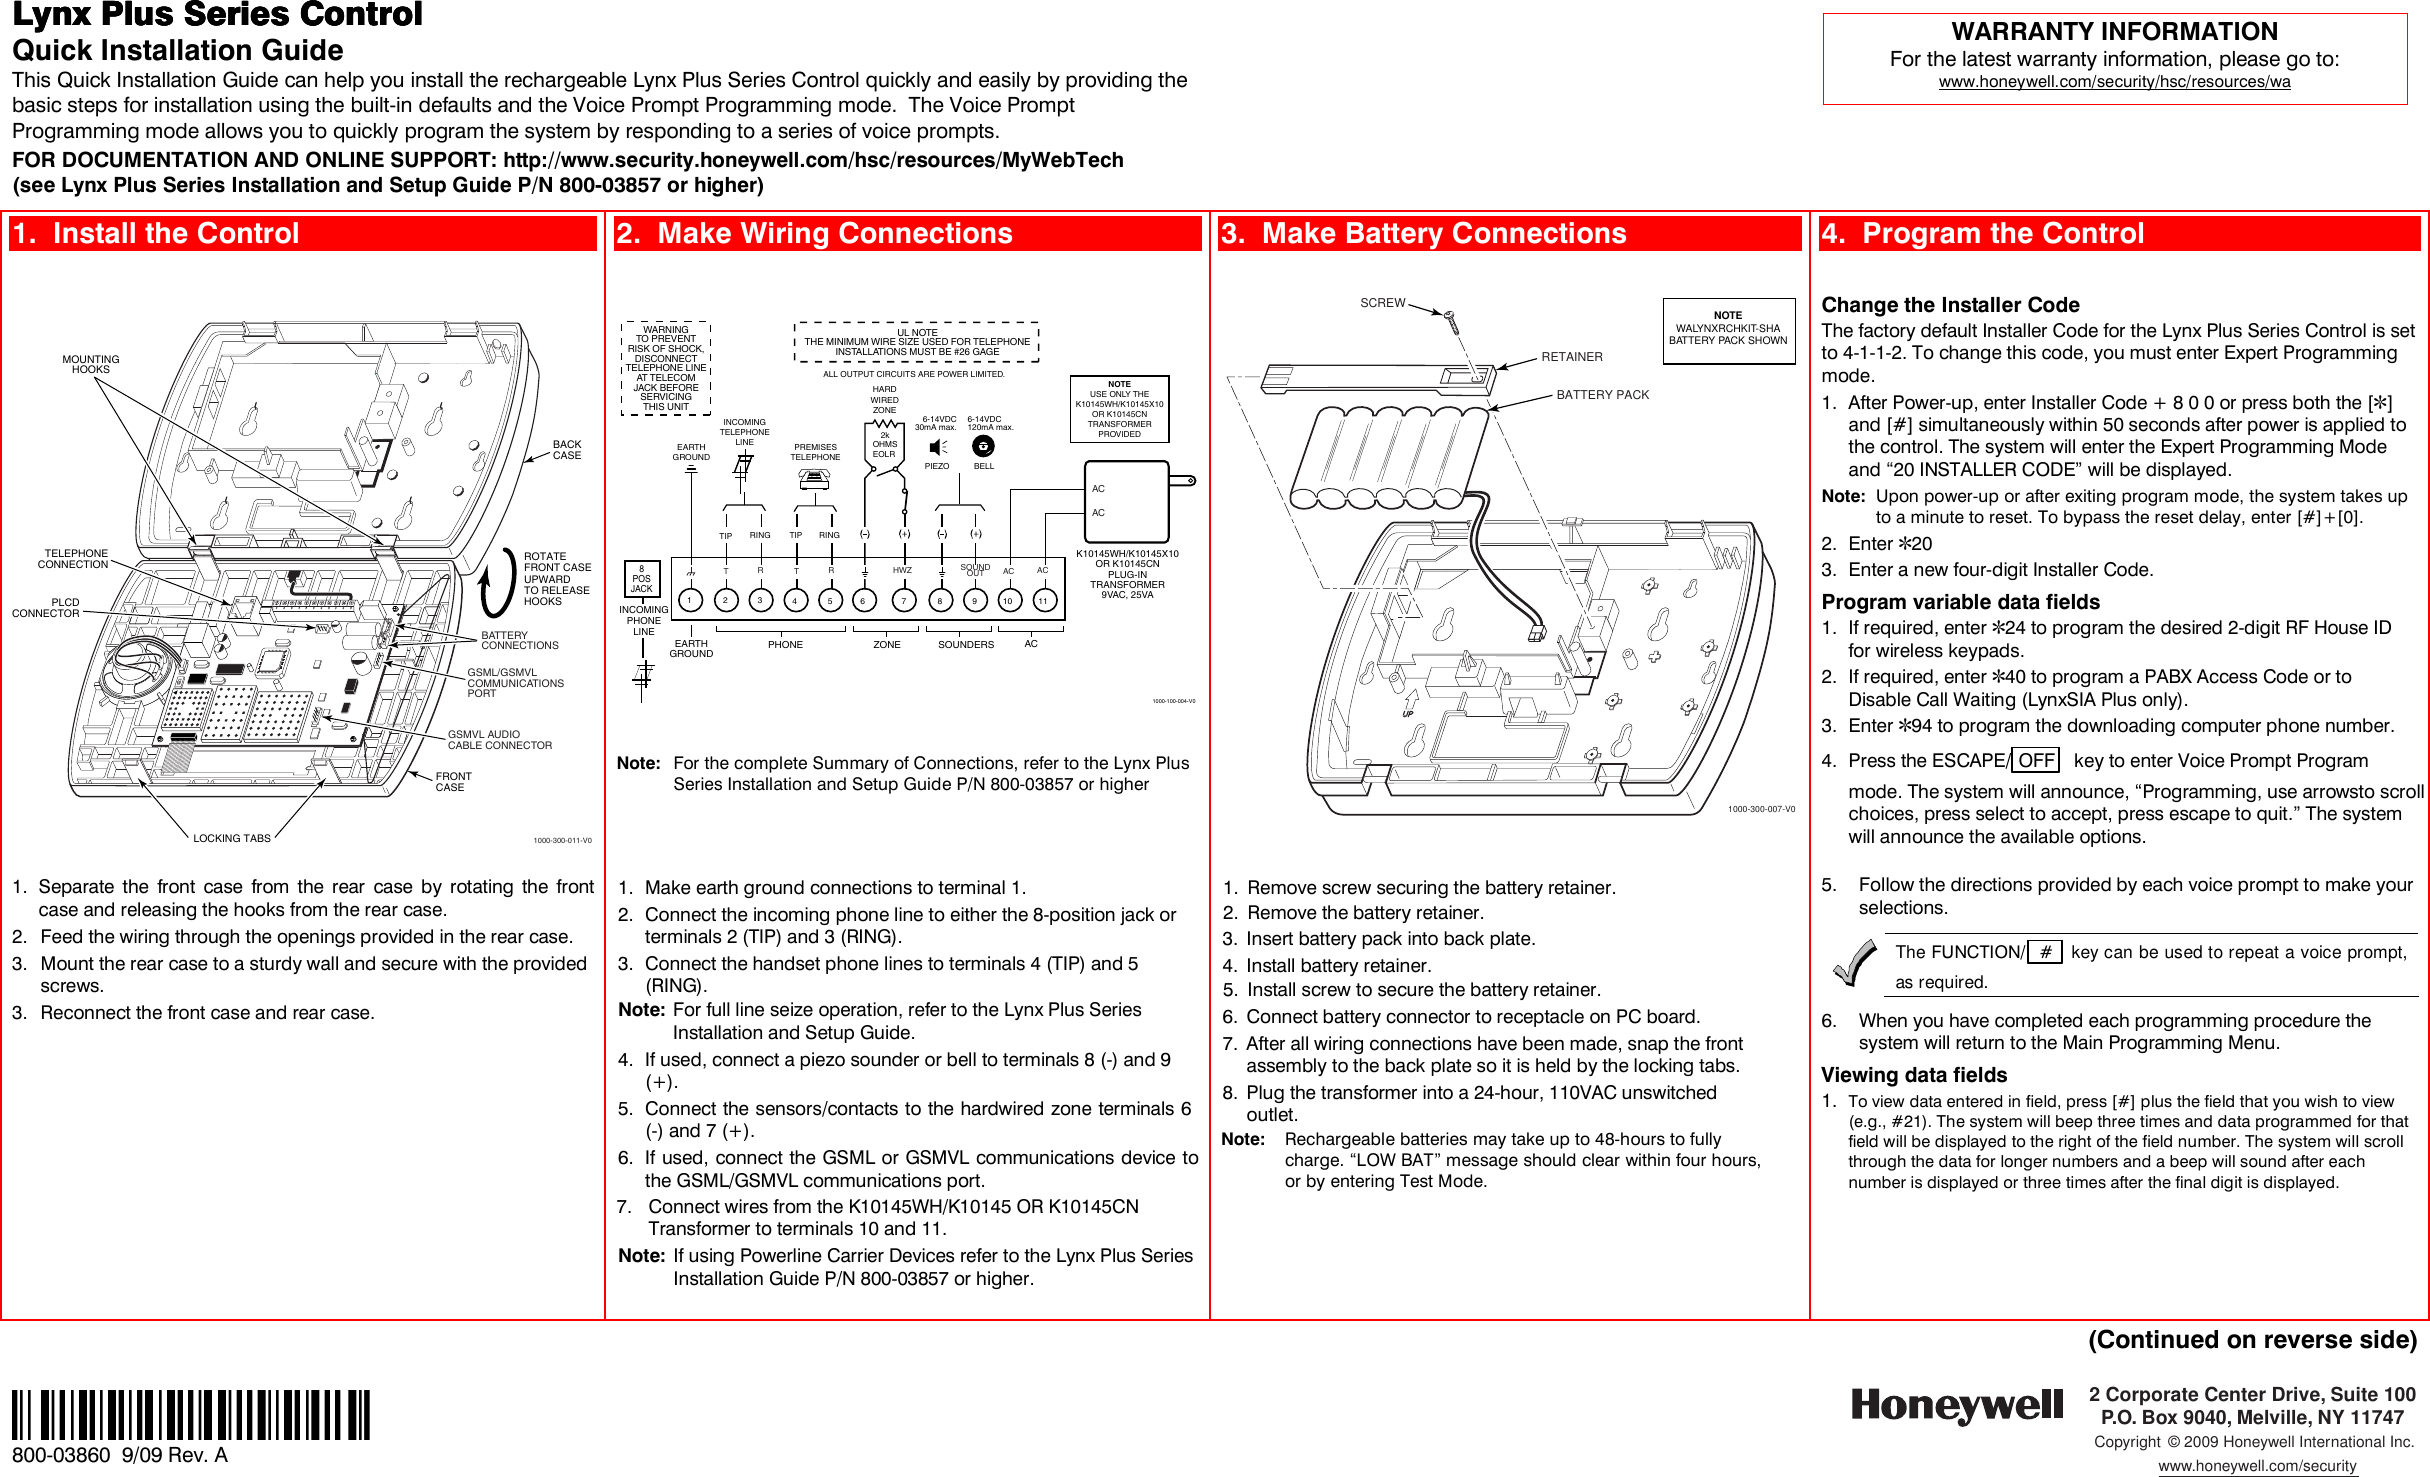 Lynx Dollhouse 1000 300 011 V0 Users Manual 800 03860 Qs Doll House Wiring